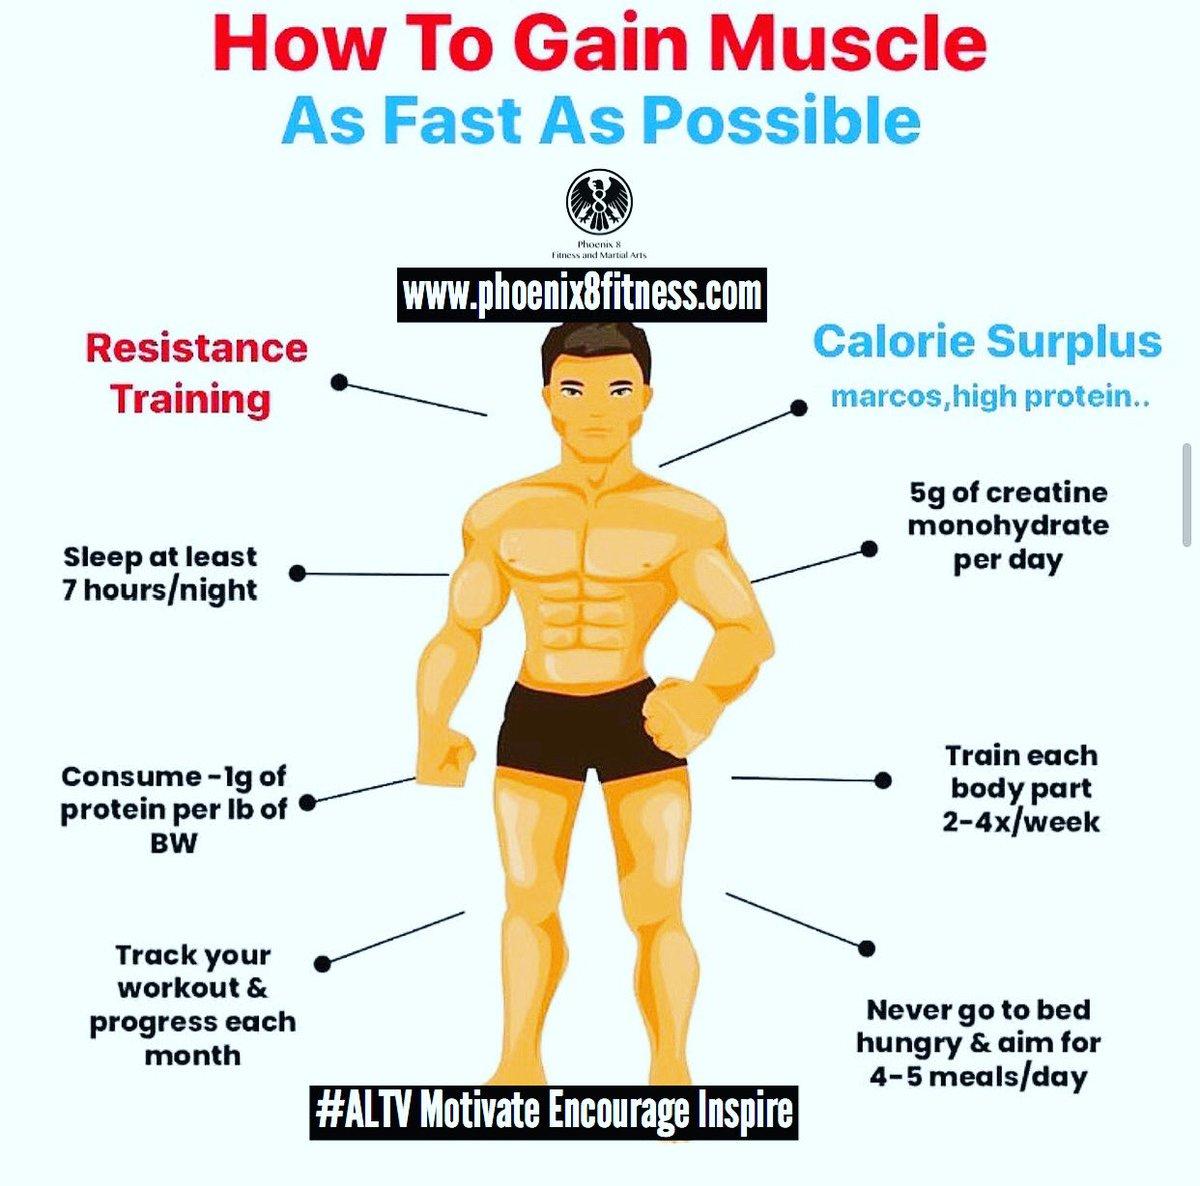 #fitness #gym #fit #instafit #workout #exercise #motivated #fitnessmotivation #dedication #kungfu #kickboxing #nutrition #martialarts #healthylifestyle #fitfam #fitnessaddict #diet #boxercise #muscle #gymrat #grind #hard #davidgogginsmotivation #altv https://t.co/Aggp9u6eT8